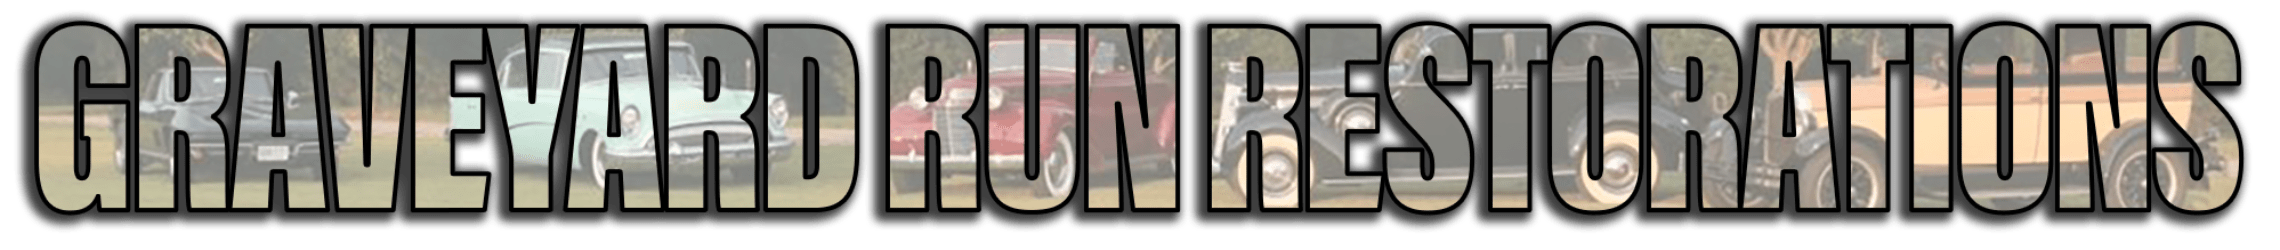 Graveyard Run Restorations